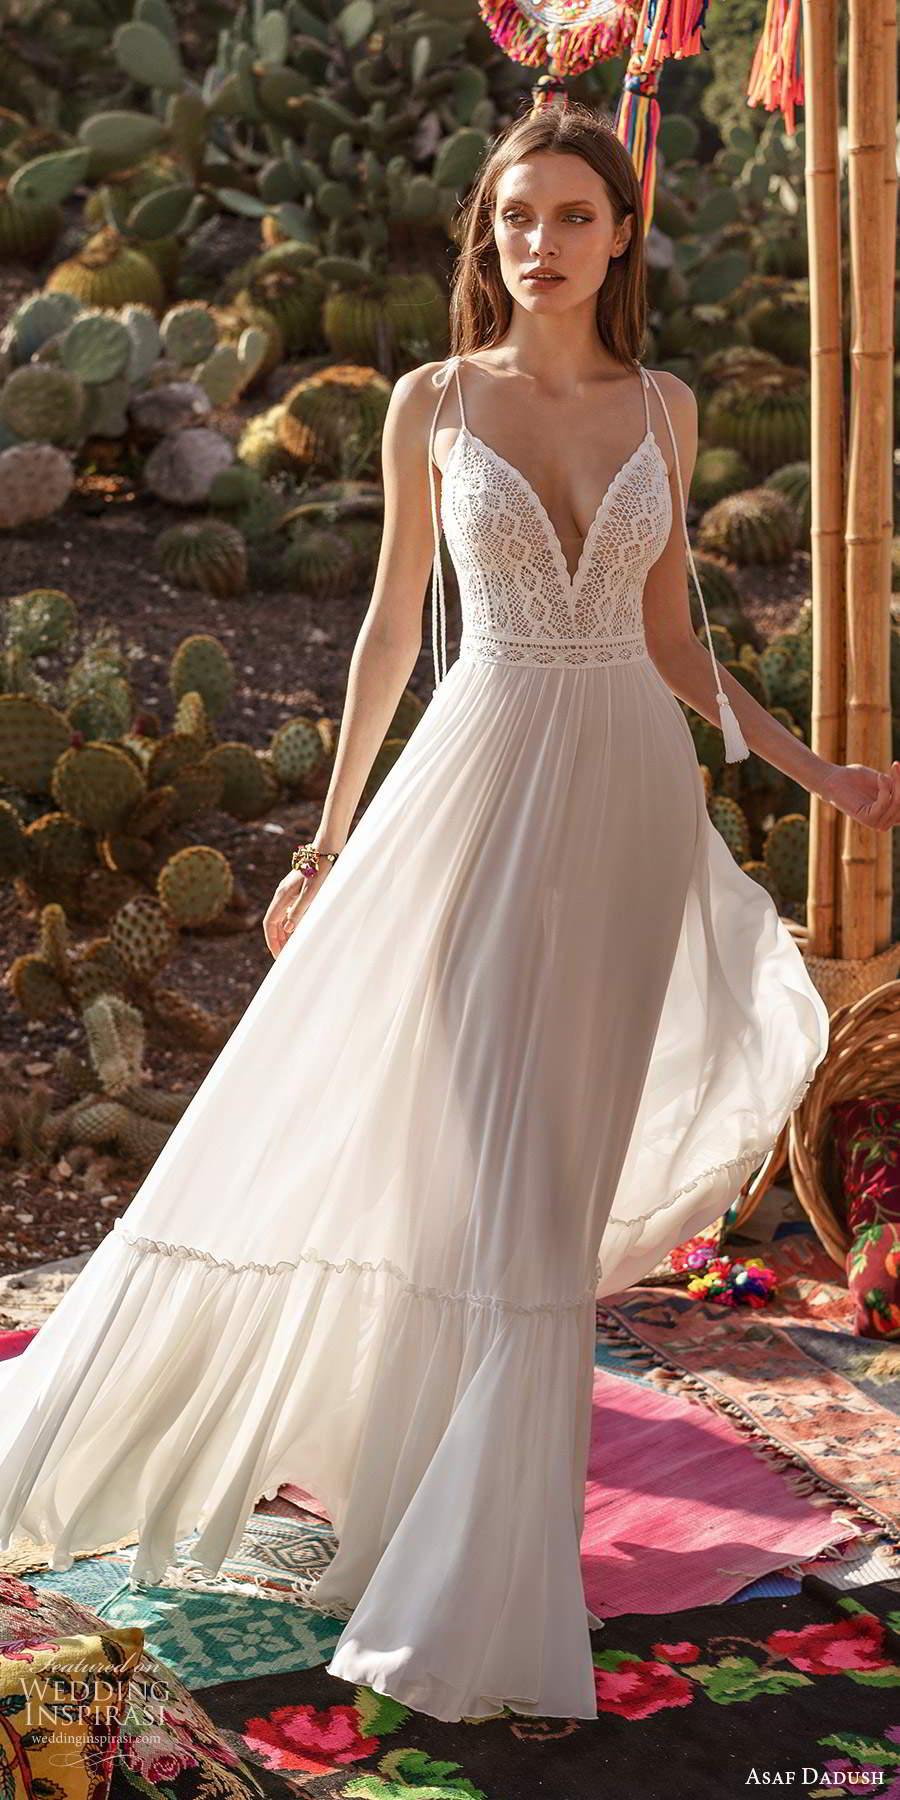 asaf dadush 2020 bridal sleeveless thin straps bow plunging v neckline embellished bodice clean skirt a line wedding dress open back (9) mv